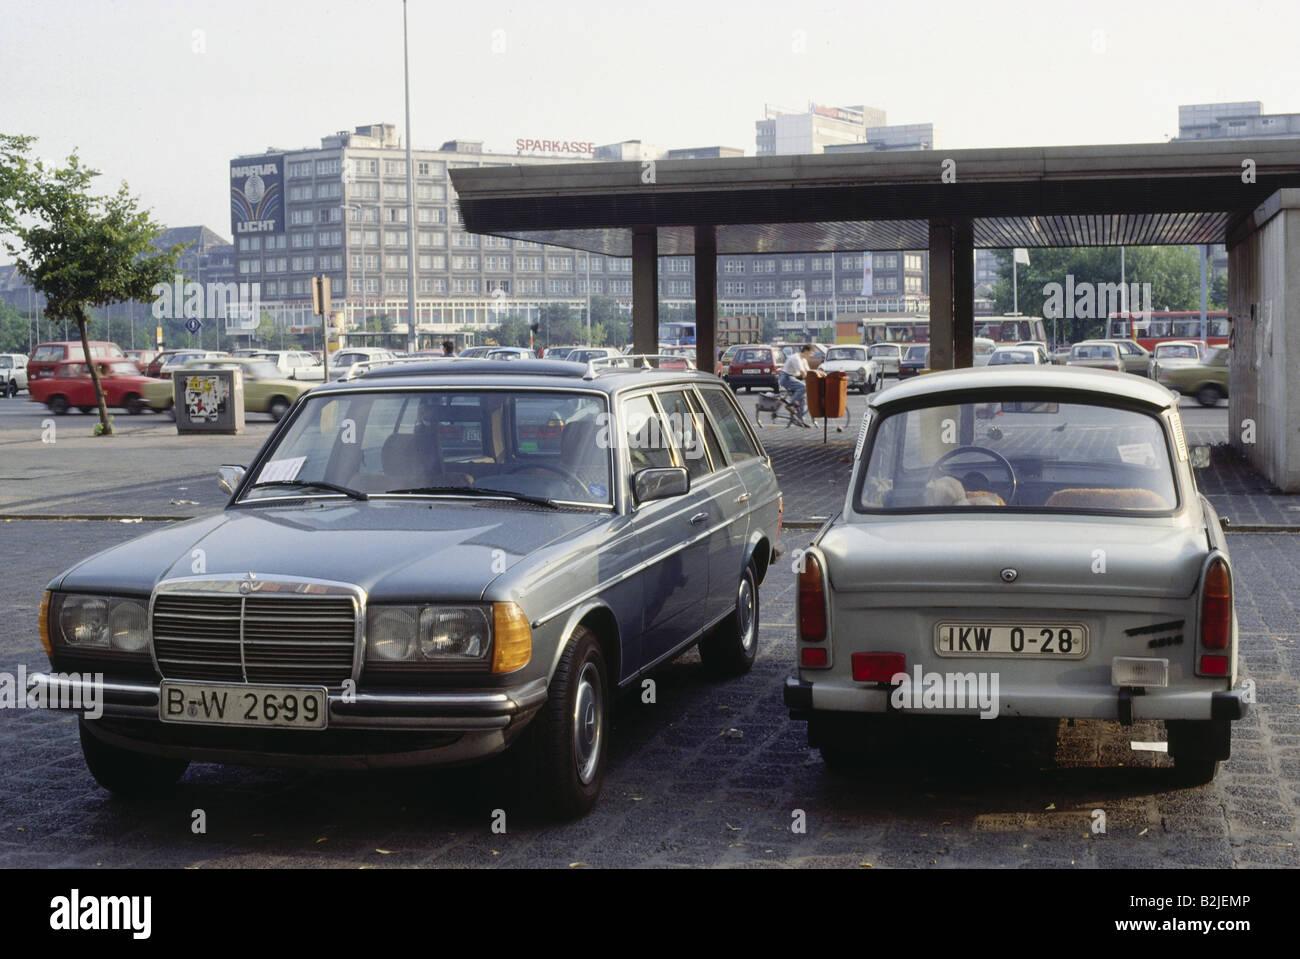 transport/ transportation, cars, Germany, Trabant, next to Mercedes, Alexanderplatz (today: Alexanderstrasse), Berlin, - Stock Image